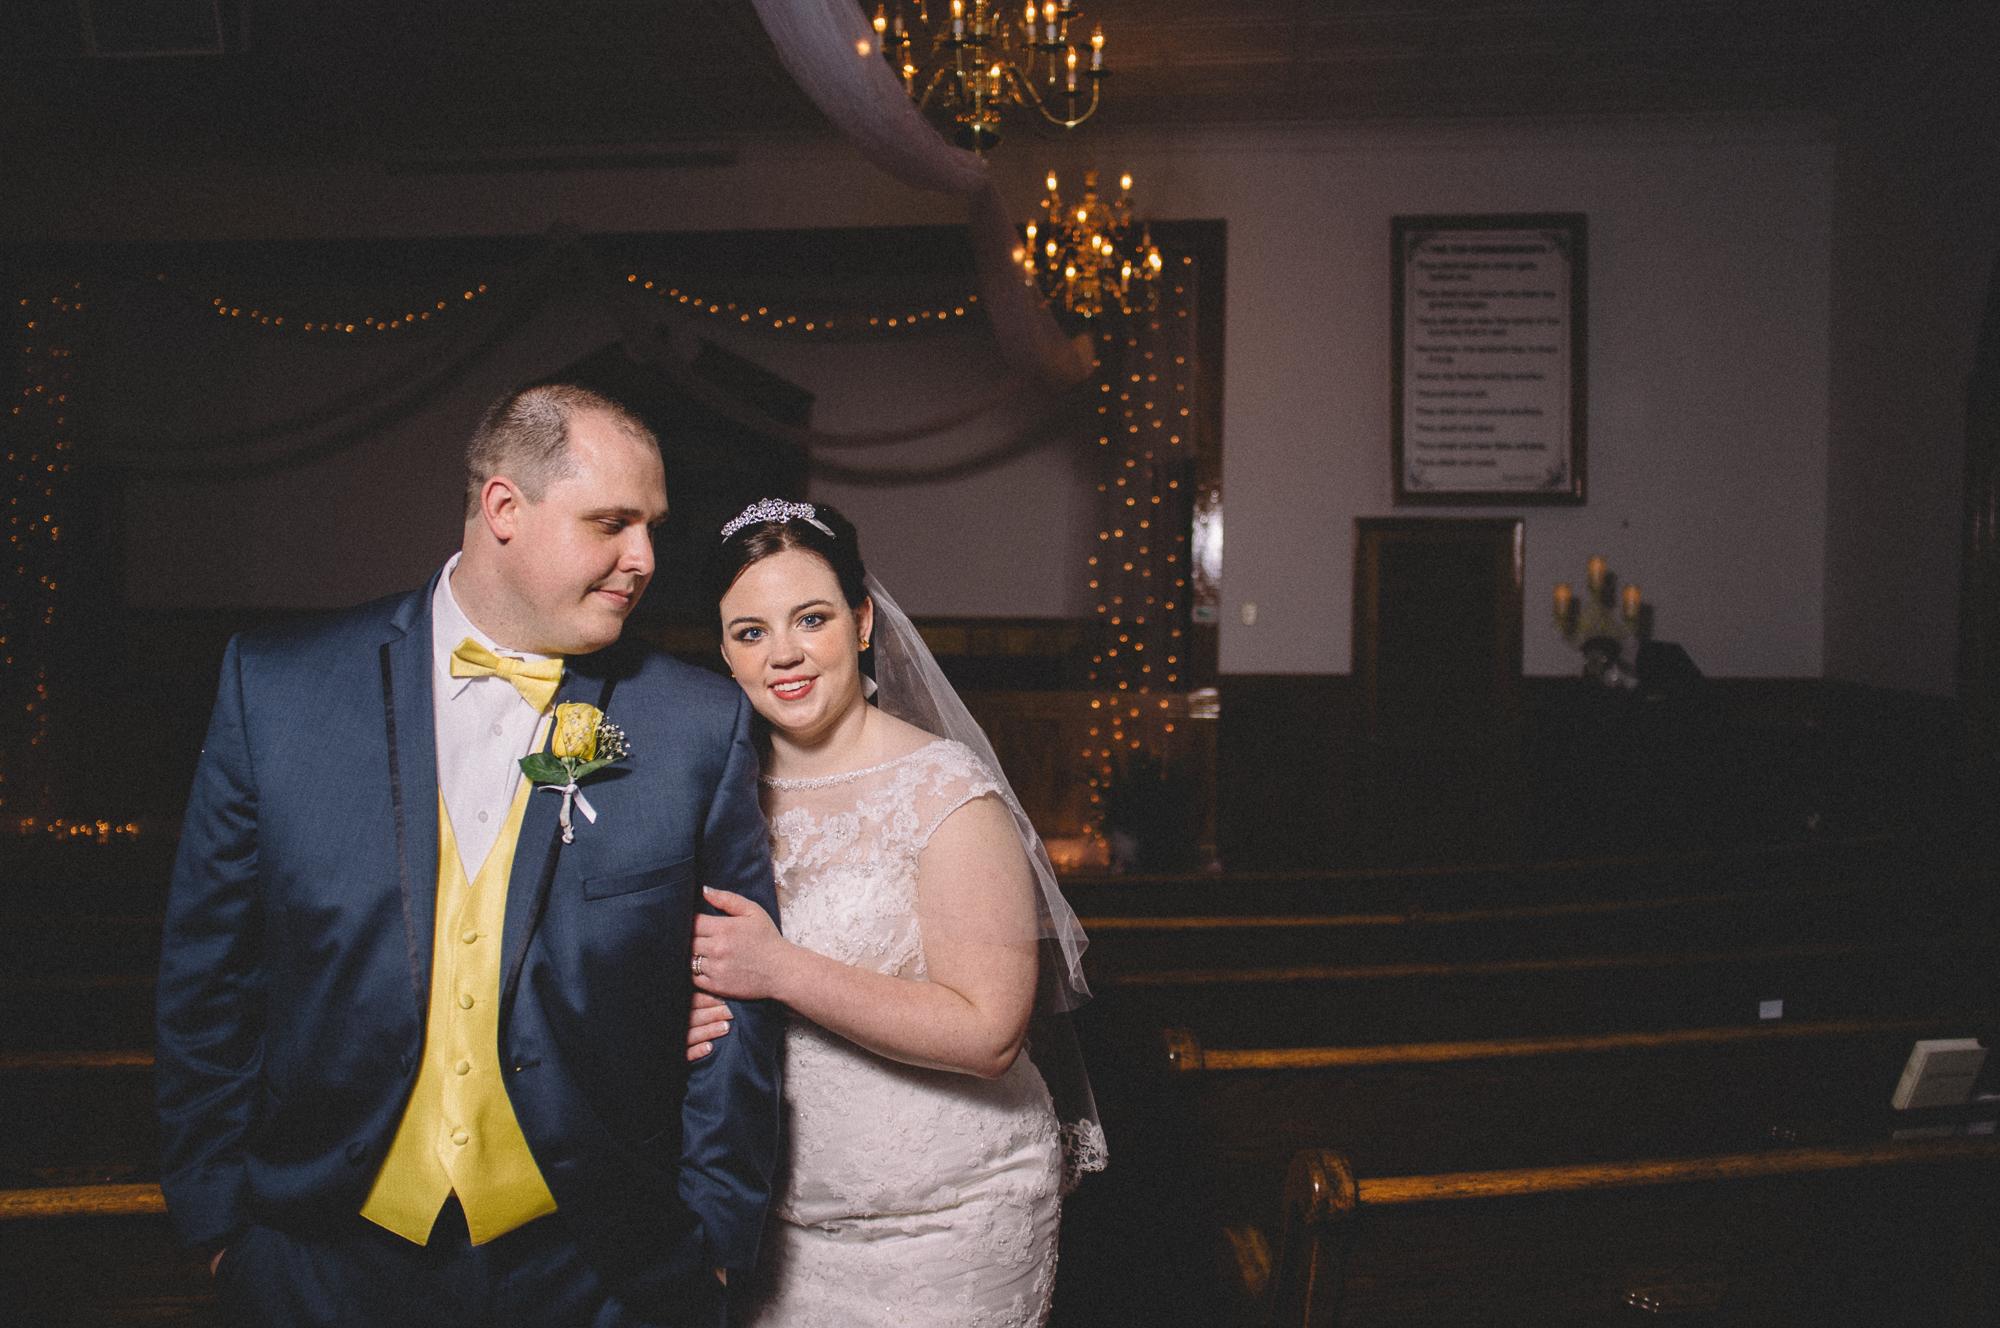 Emily-Shay-wedding-blog-23.jpg